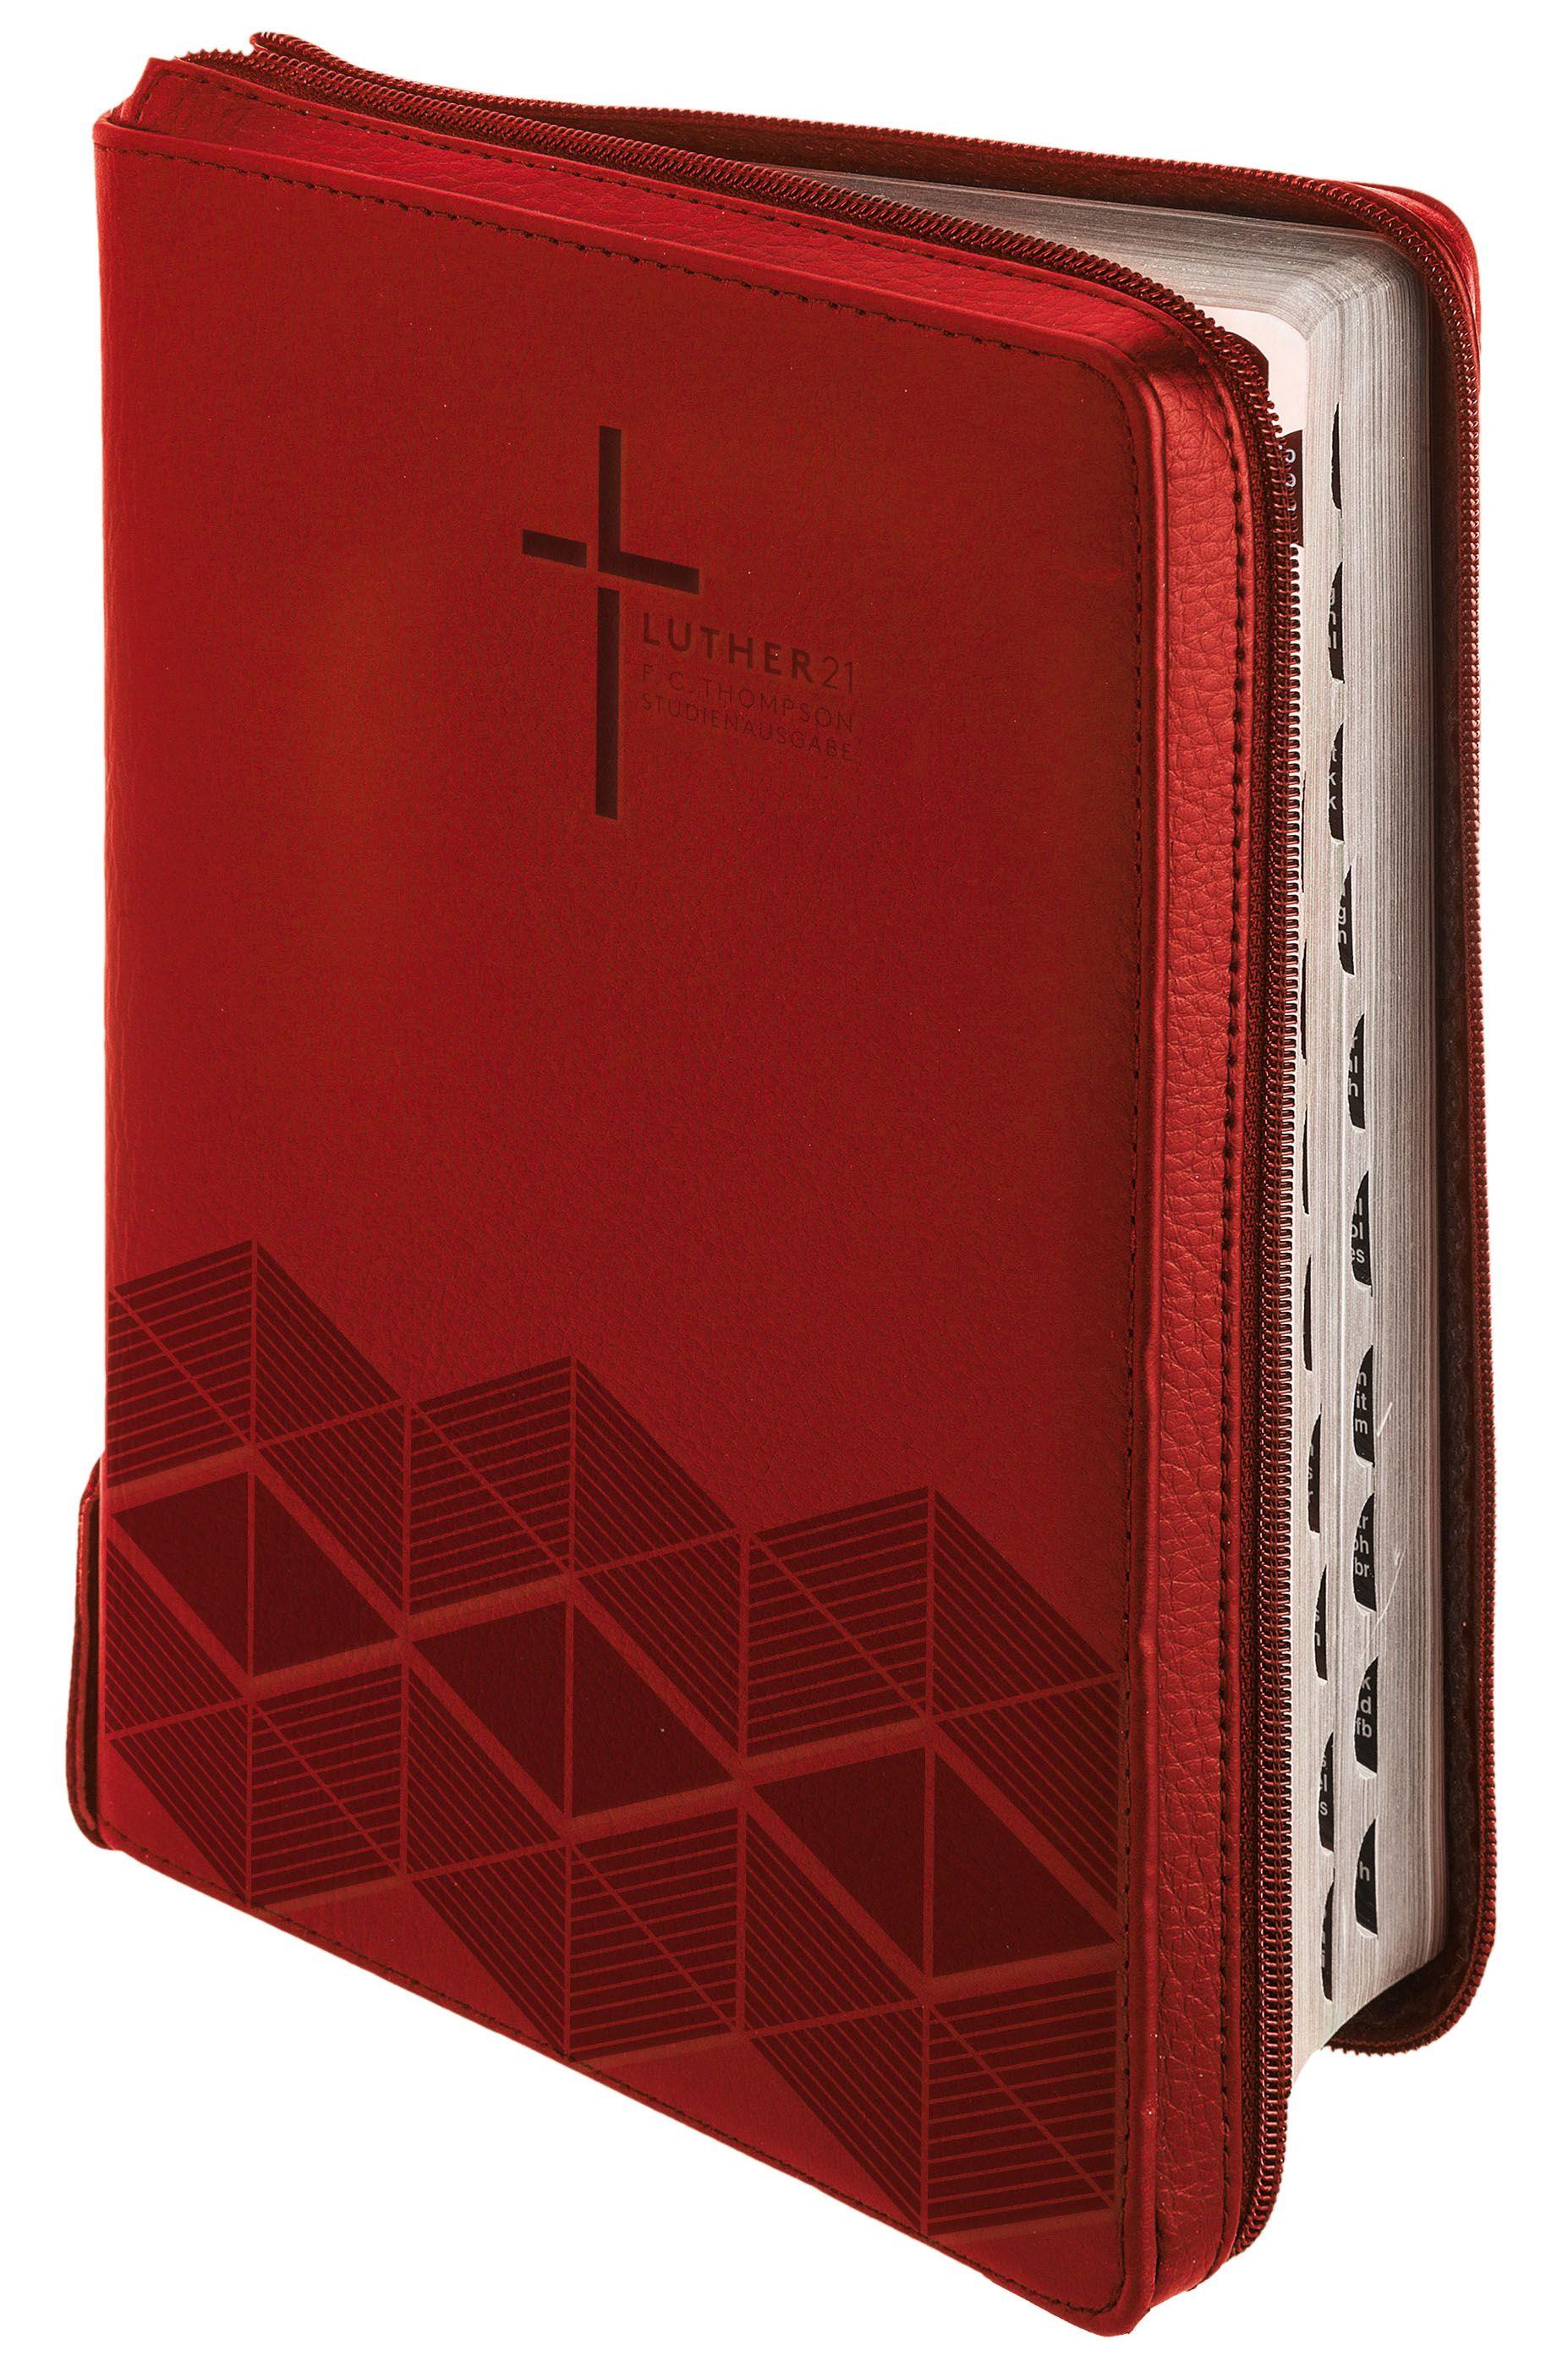 Luther21 - F.C.Thompson Studienausgabe - Taschenausgabe Kunstleder rot